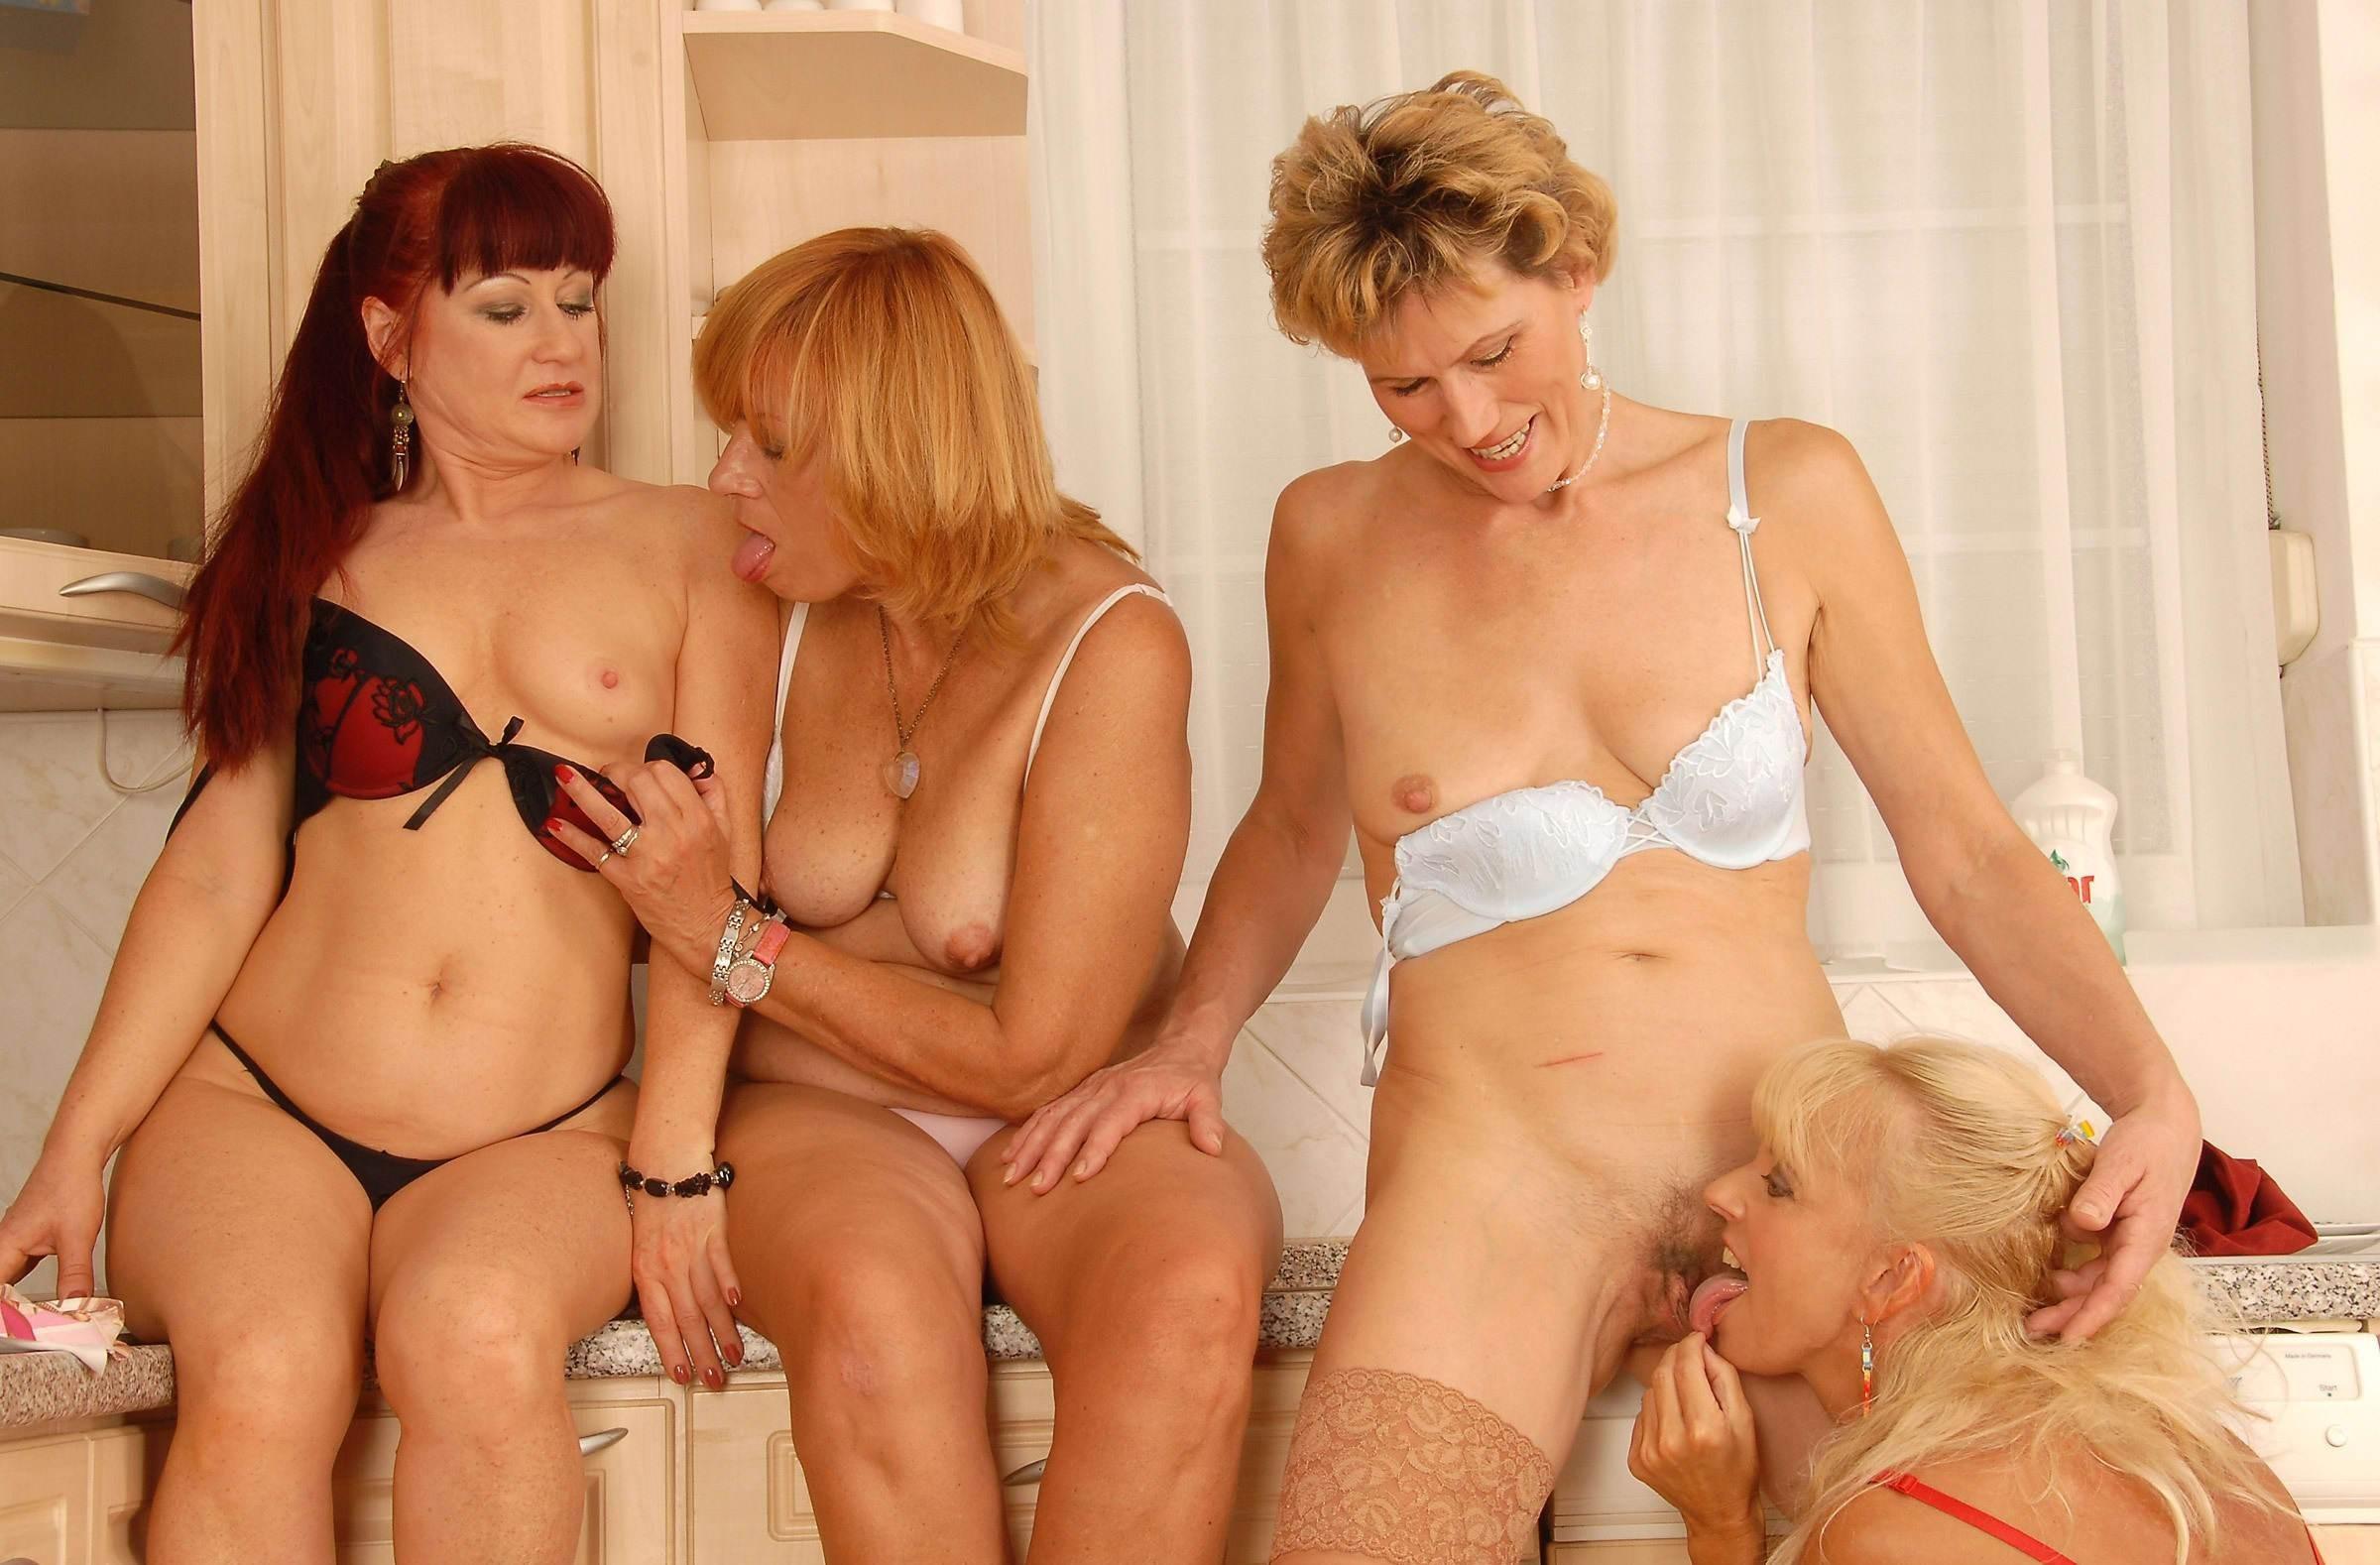 Порно Старые Лесбиянки Онлайн